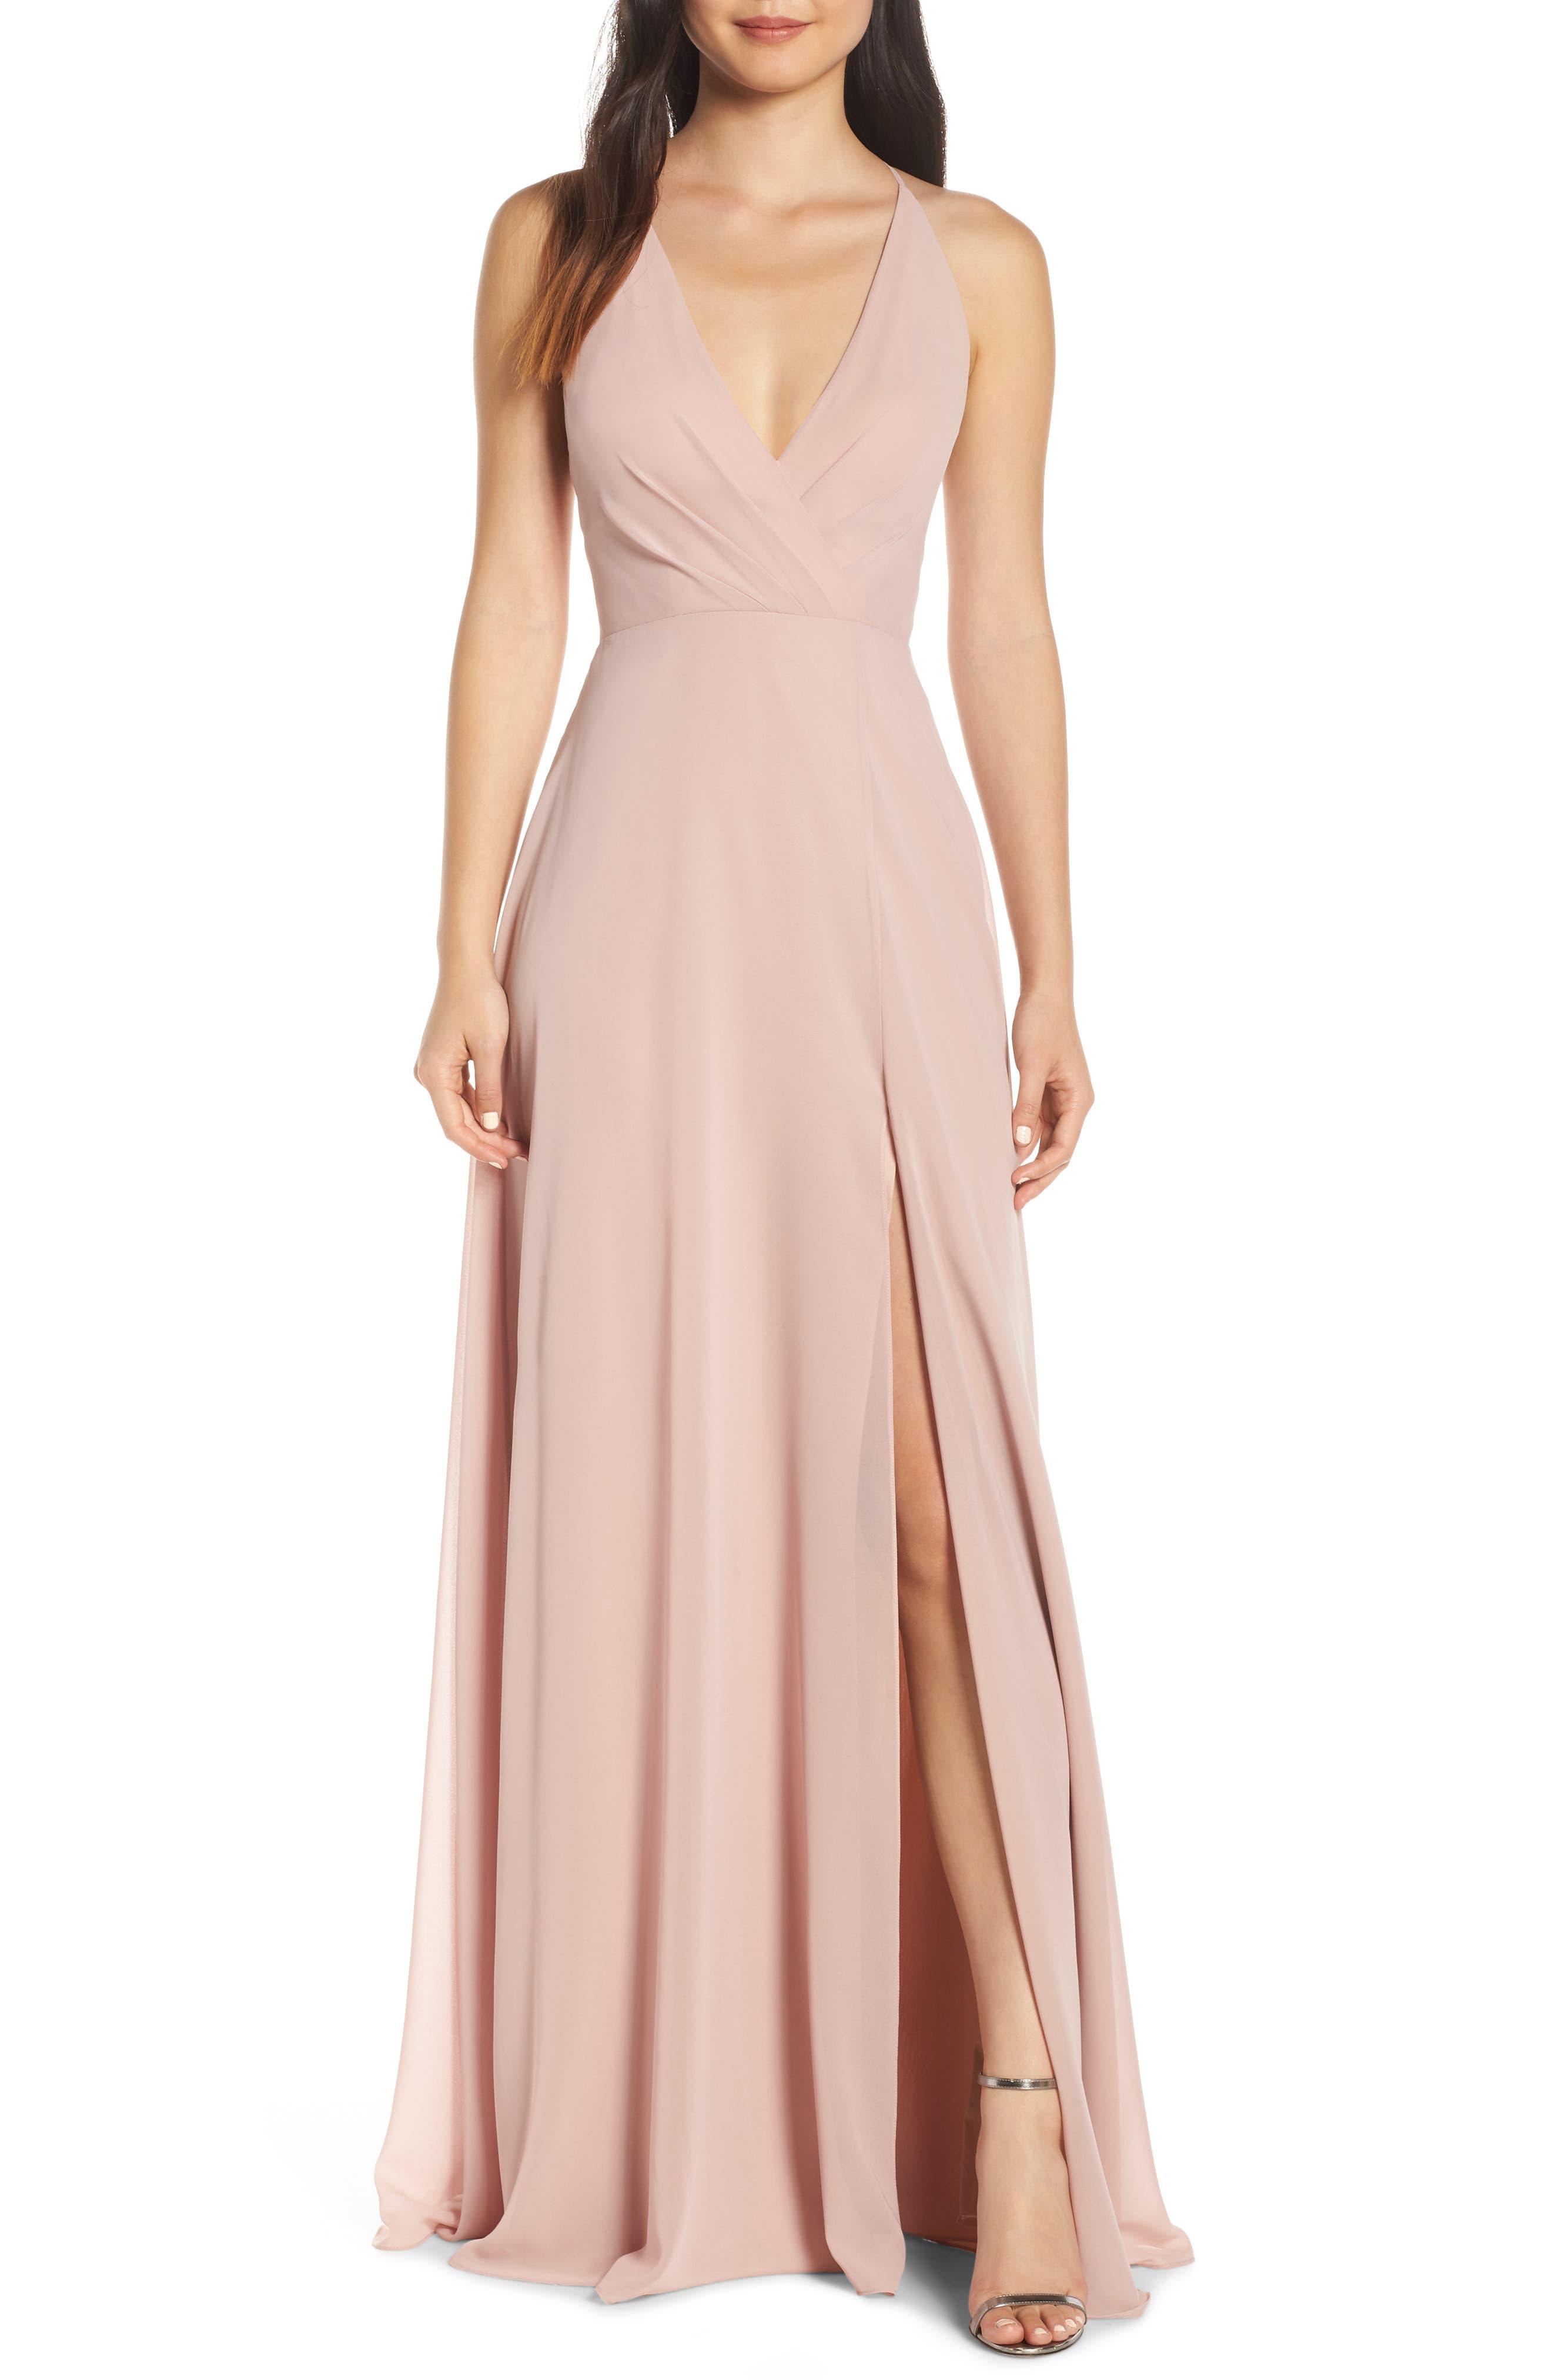 Jenny Yoo Bryce Surplice V-Neck Chiffon Evening Dress, 8 (similar to 1) - Pink